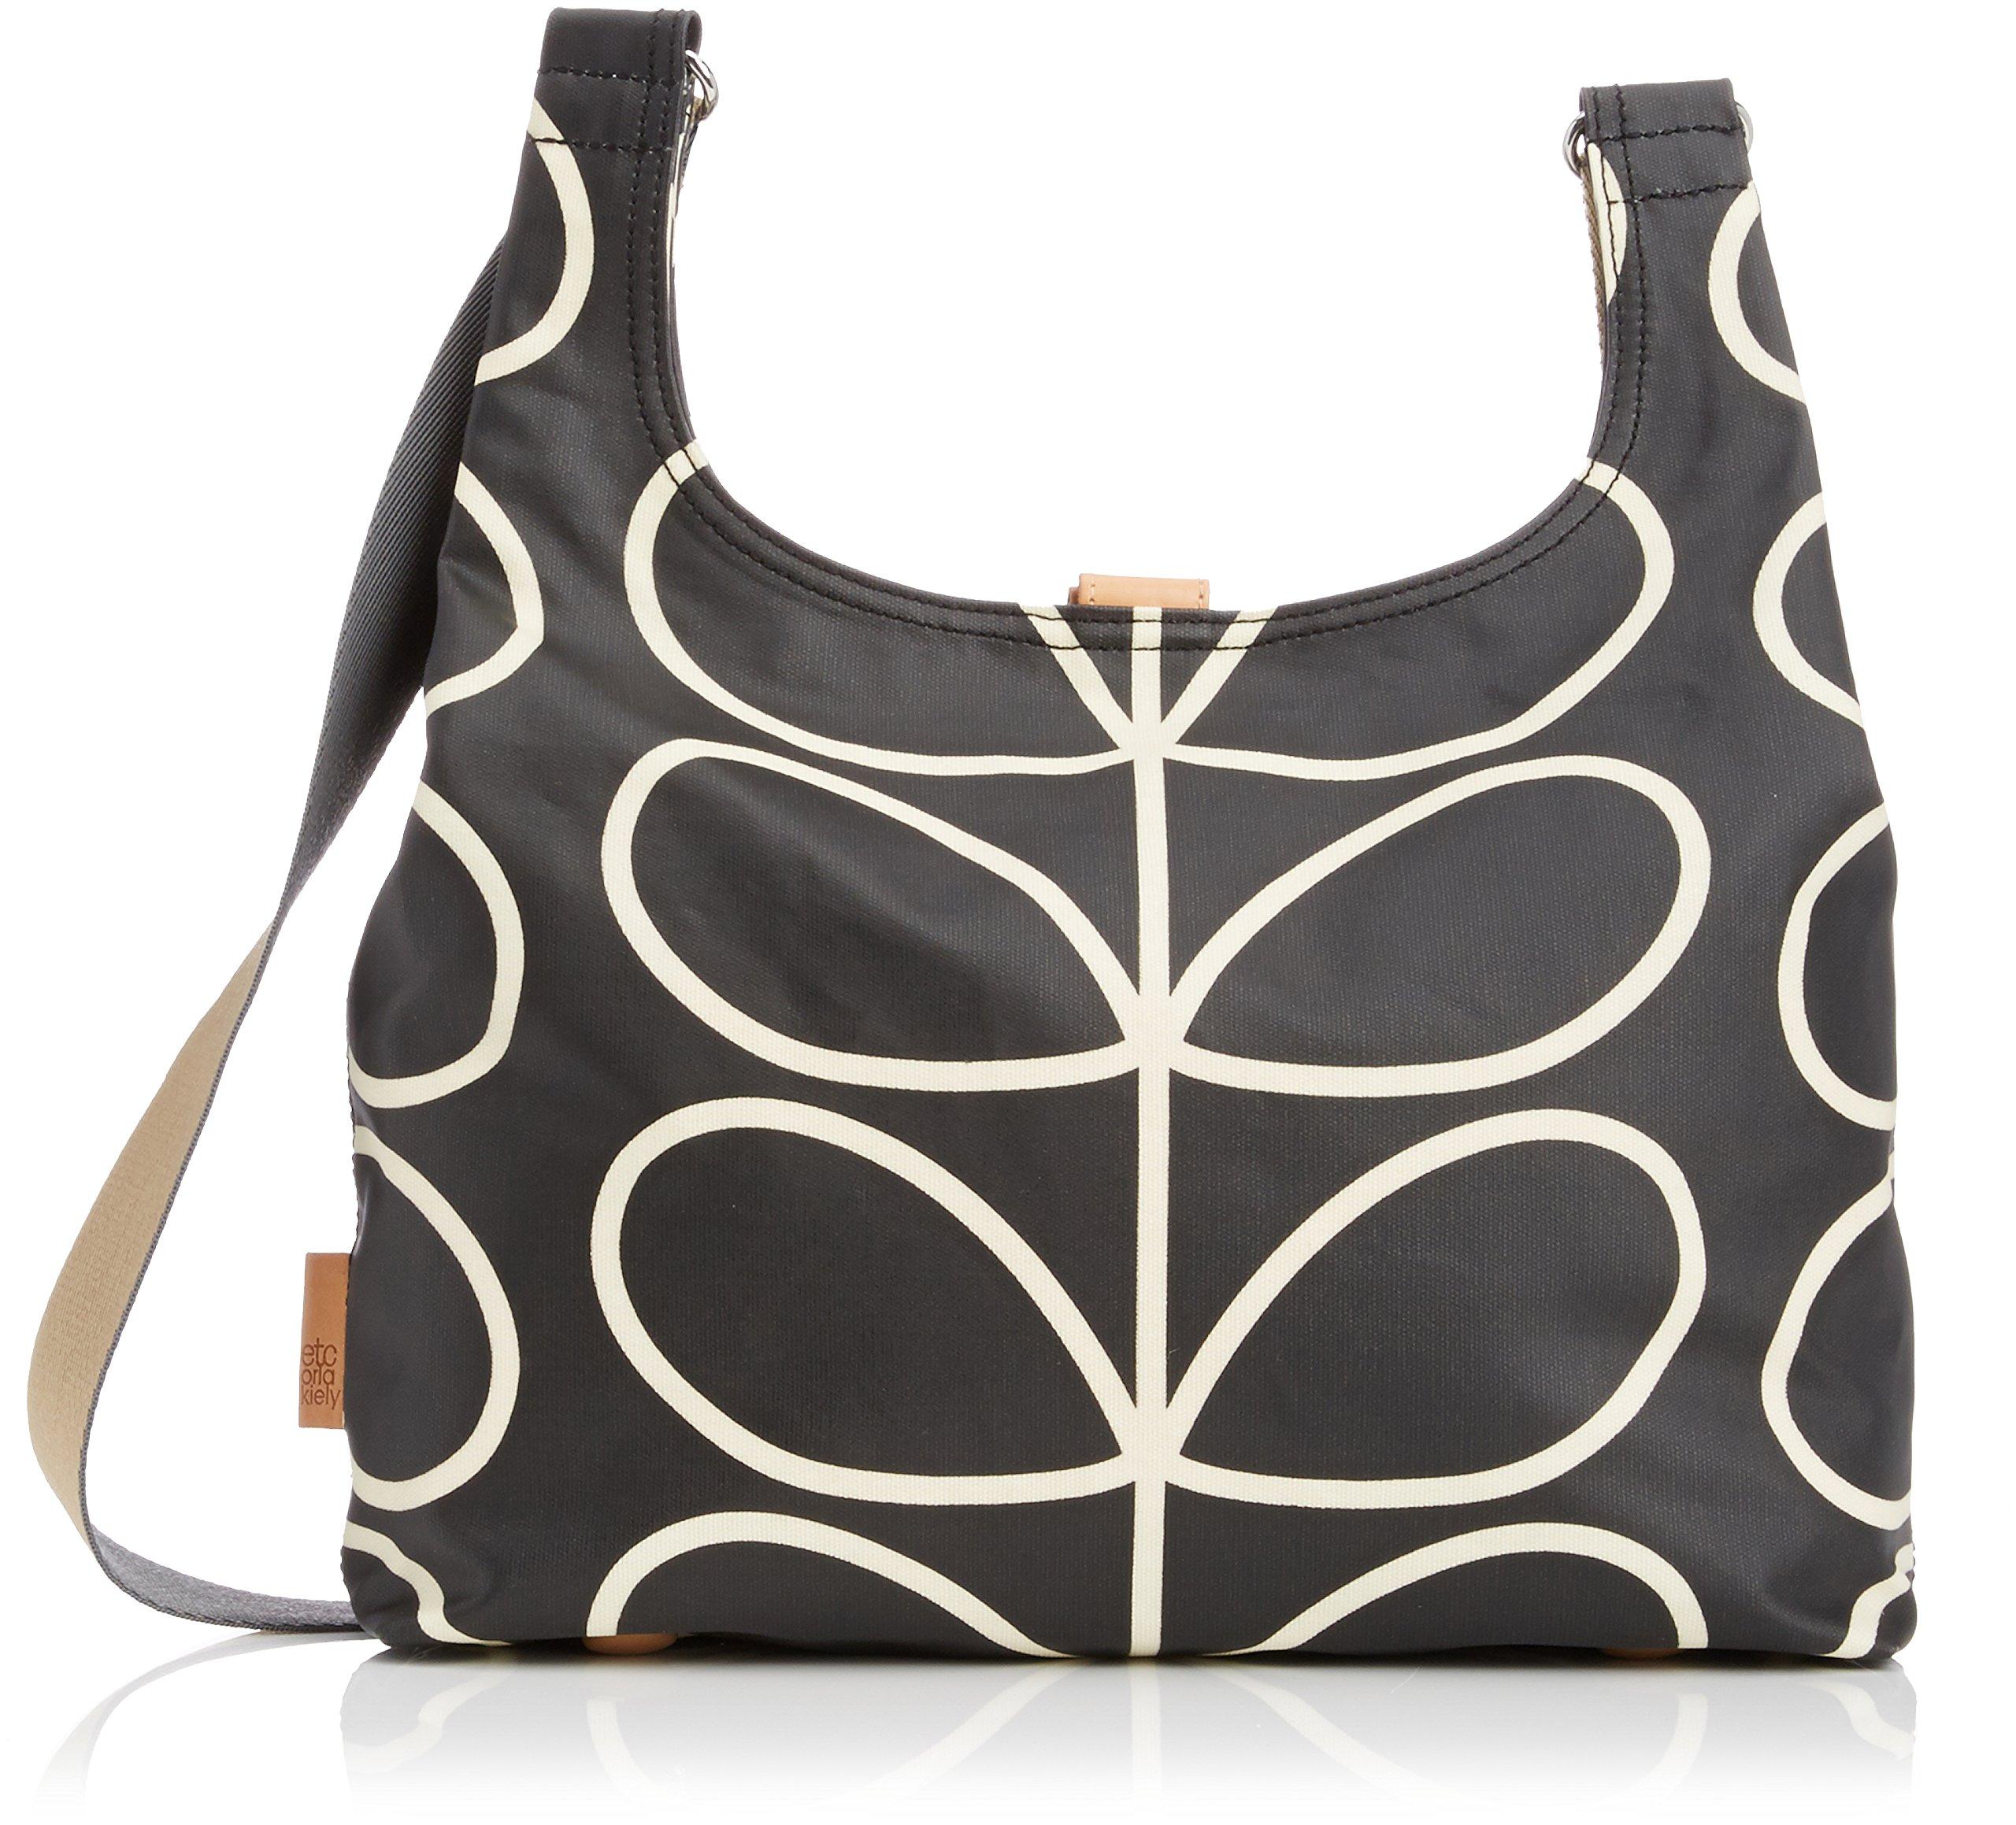 Etc Giant Linear Stem Midi Sling Bag Cross Body, Black+Cream, One Size